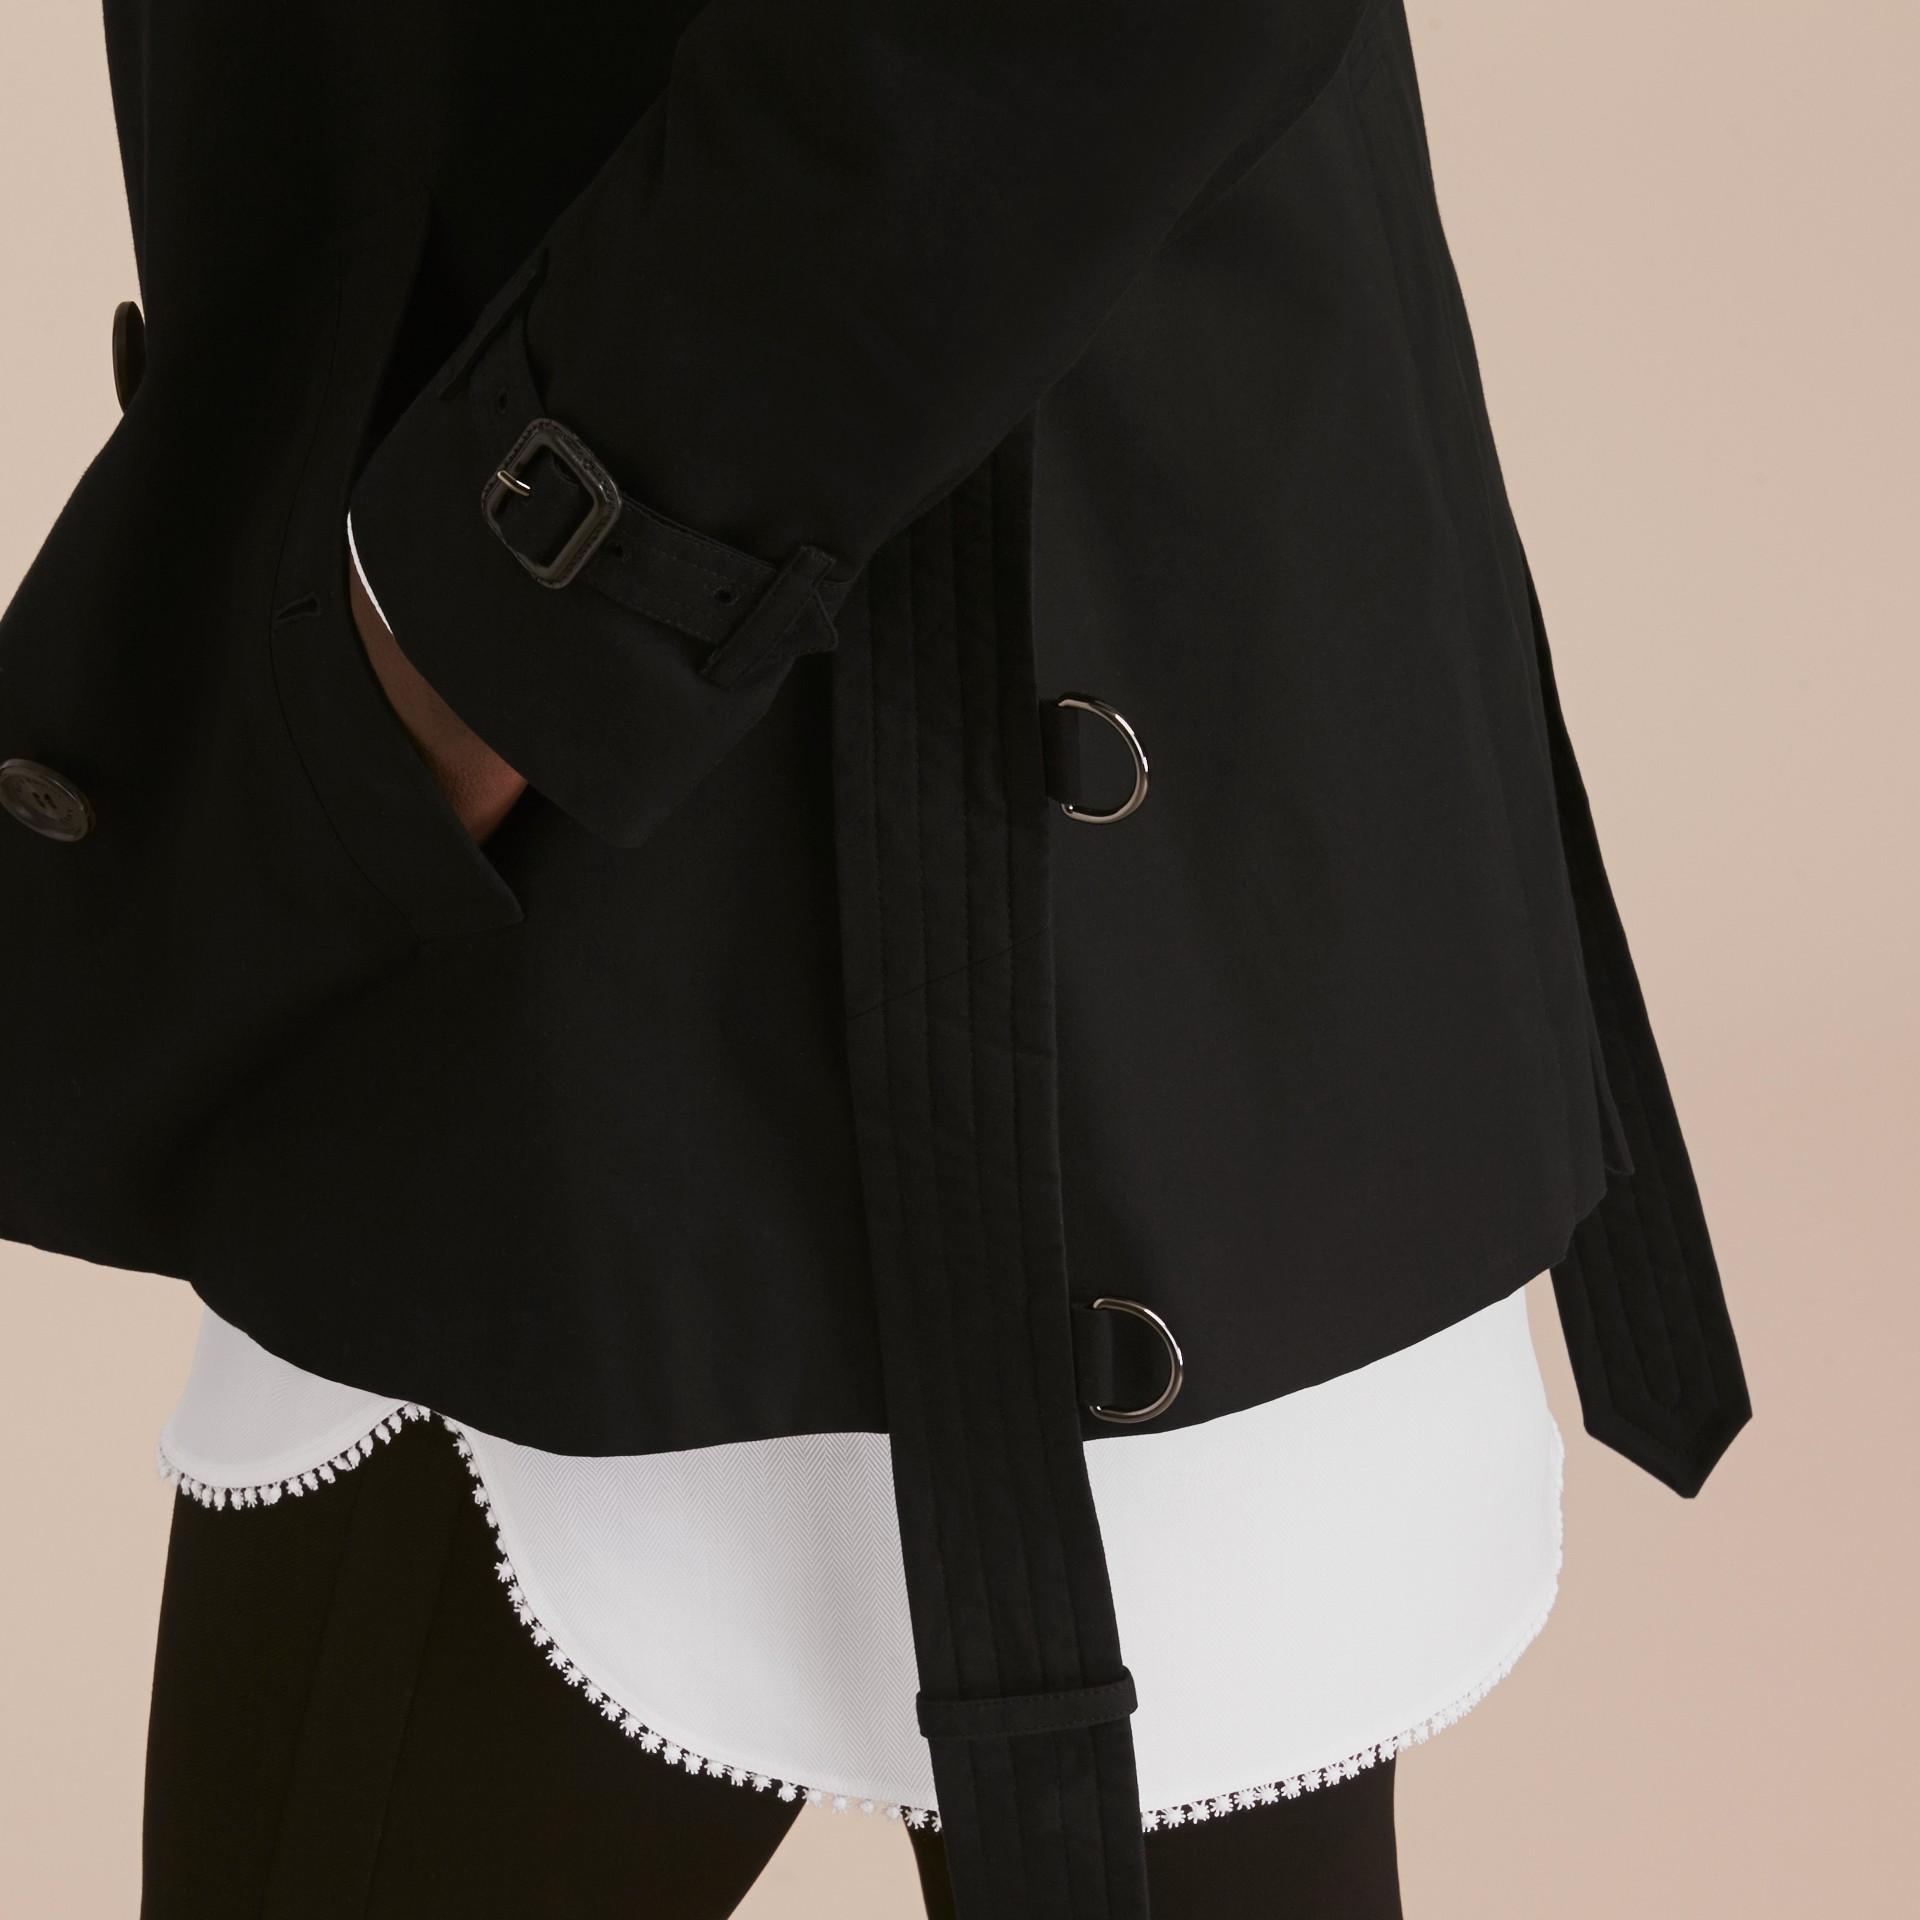 Negro Trench coat Chelsea – Trench coat Heritage corto Negro - imagen de la galería 6